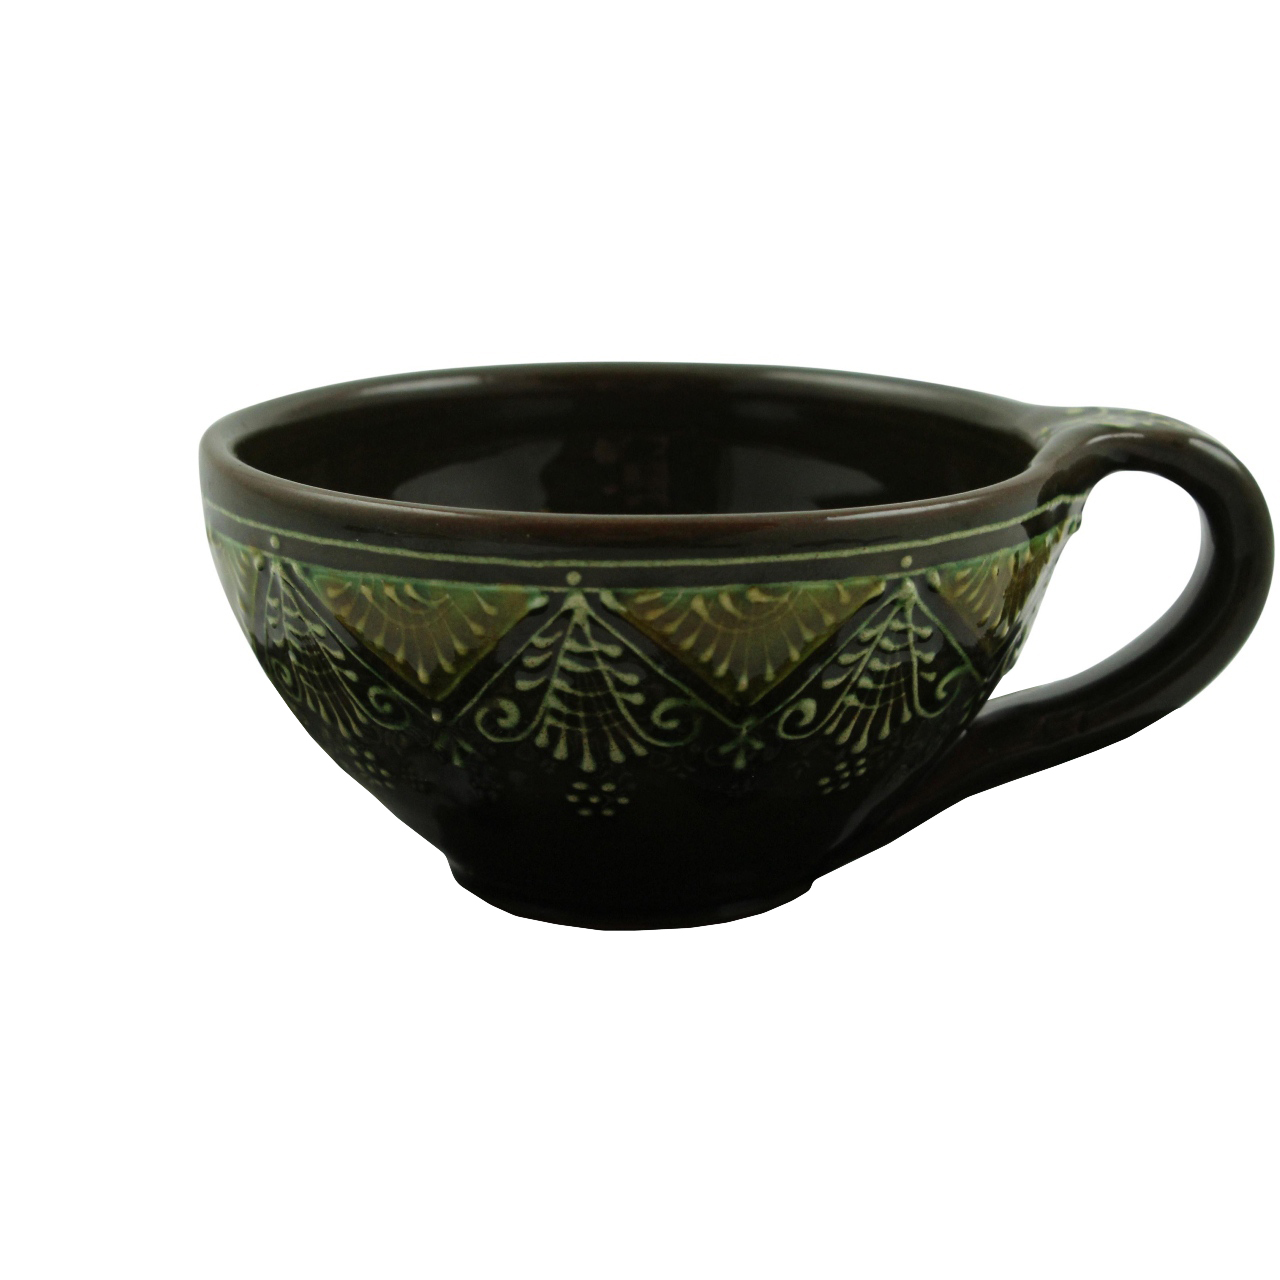 Ceasca Traditionala Din Ceramica Oliv